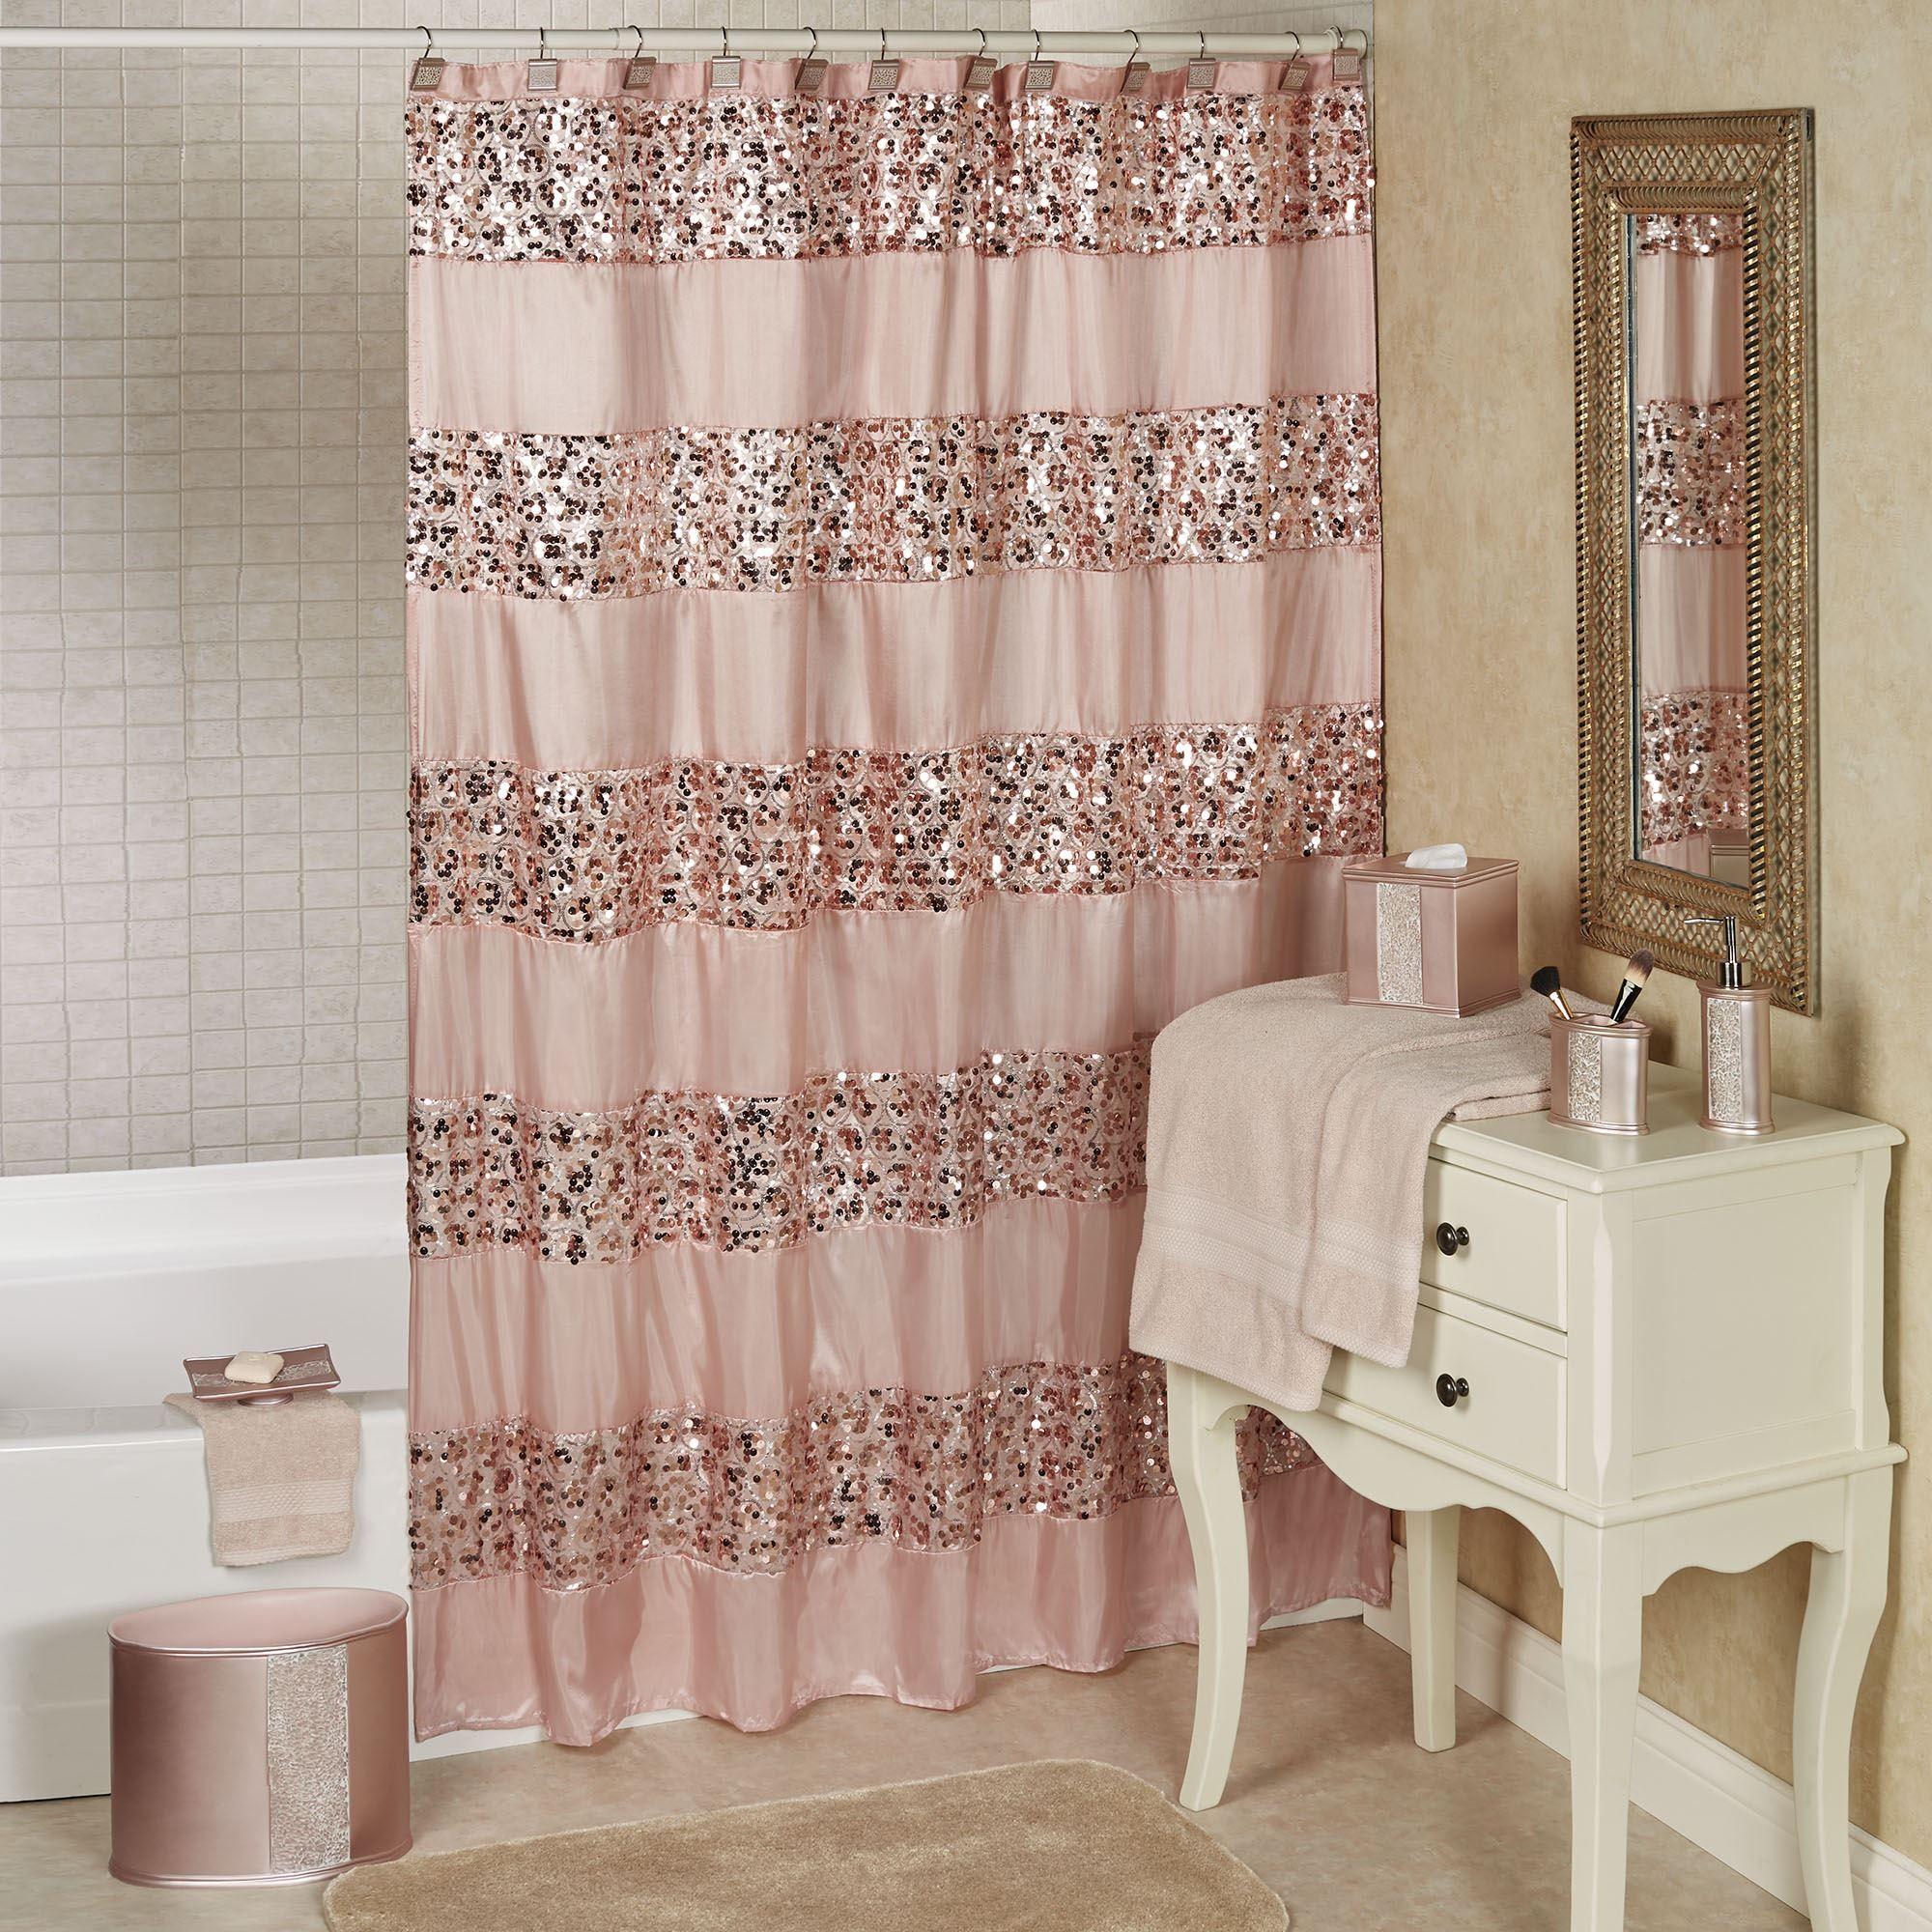 Sinatra Pale Blush Sequined Shower Curtain, Sinatra Bathroom Accessories